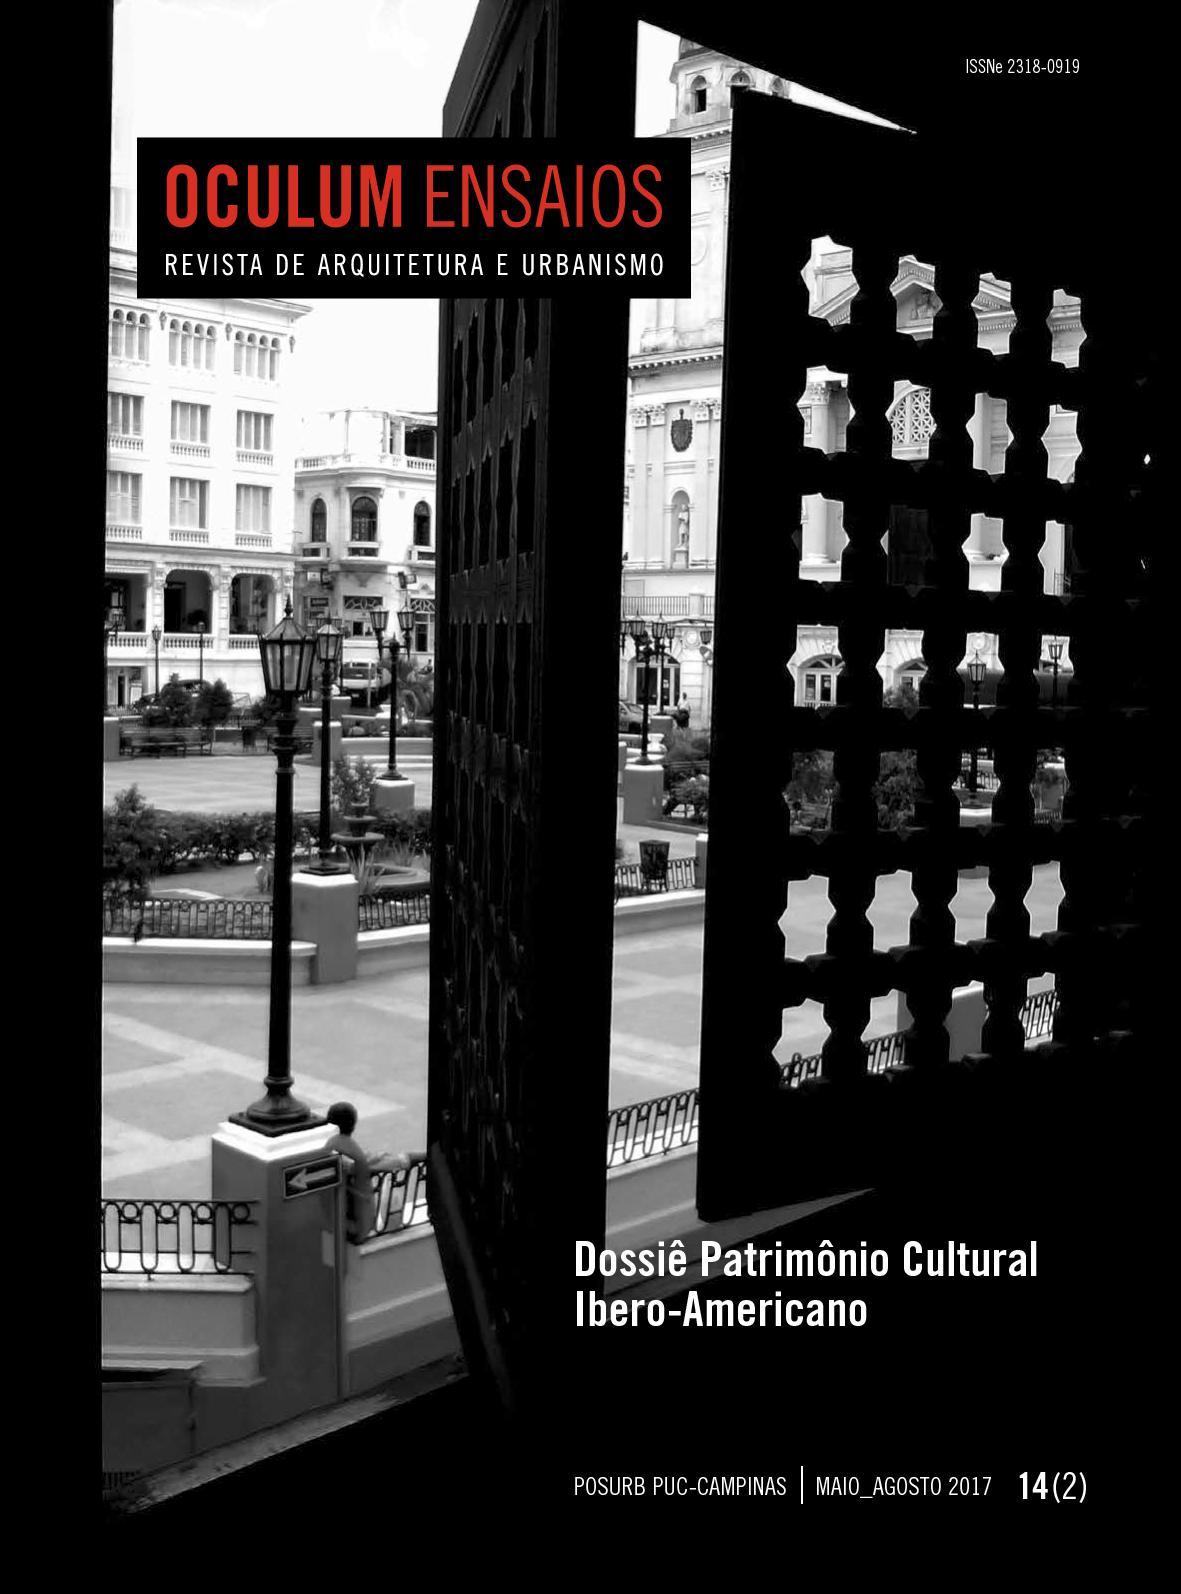 Calaméo - Oculum N 14 - Dossiê Patrimônio Cultural Ibero-Americano -  Arquitetura e Urbanismo 7aa3aabb6b4